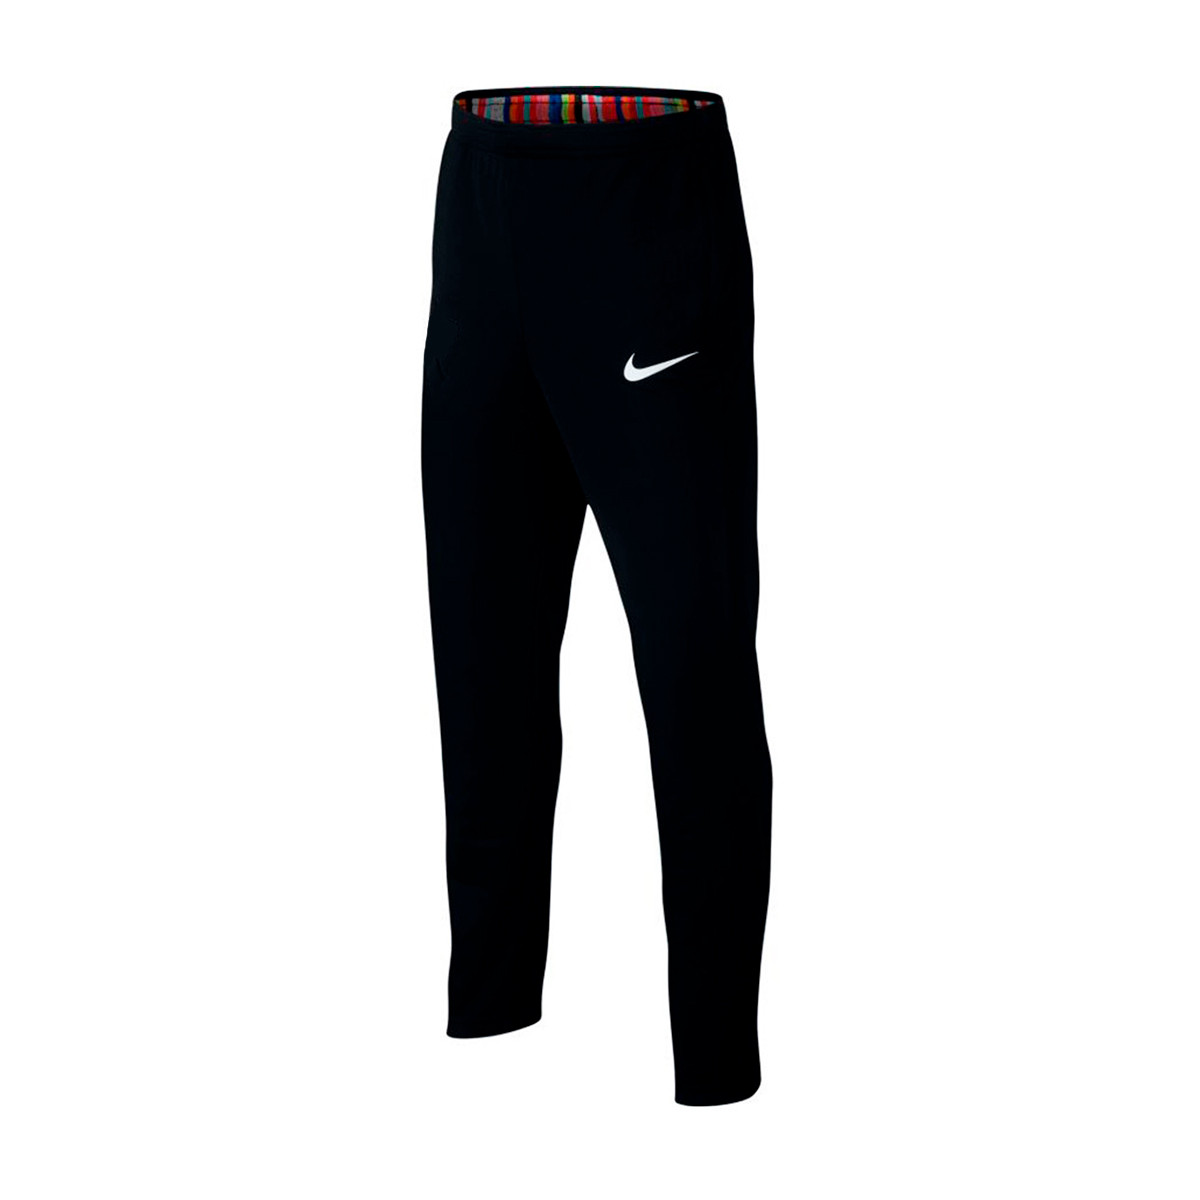 496205f07 Long pants Nike NK Dry LVL Up KPZ Niño Black-White - Football store ...